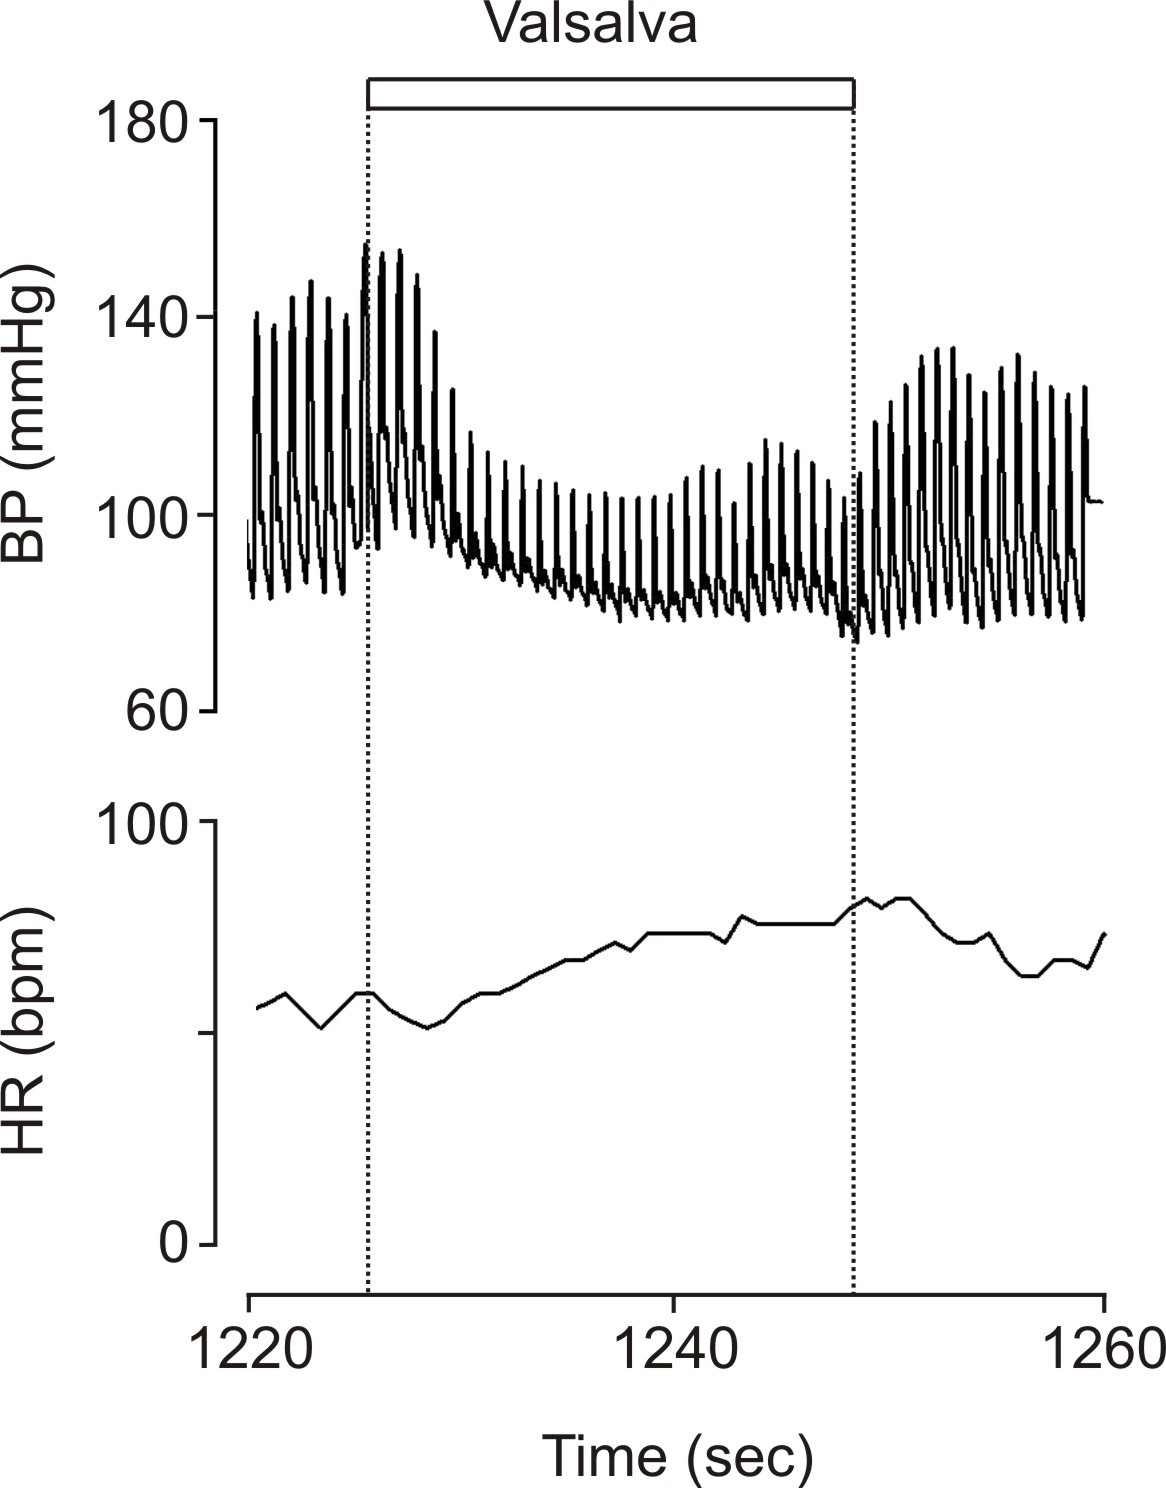 Valsalva manoeuvre blood pressure legionella